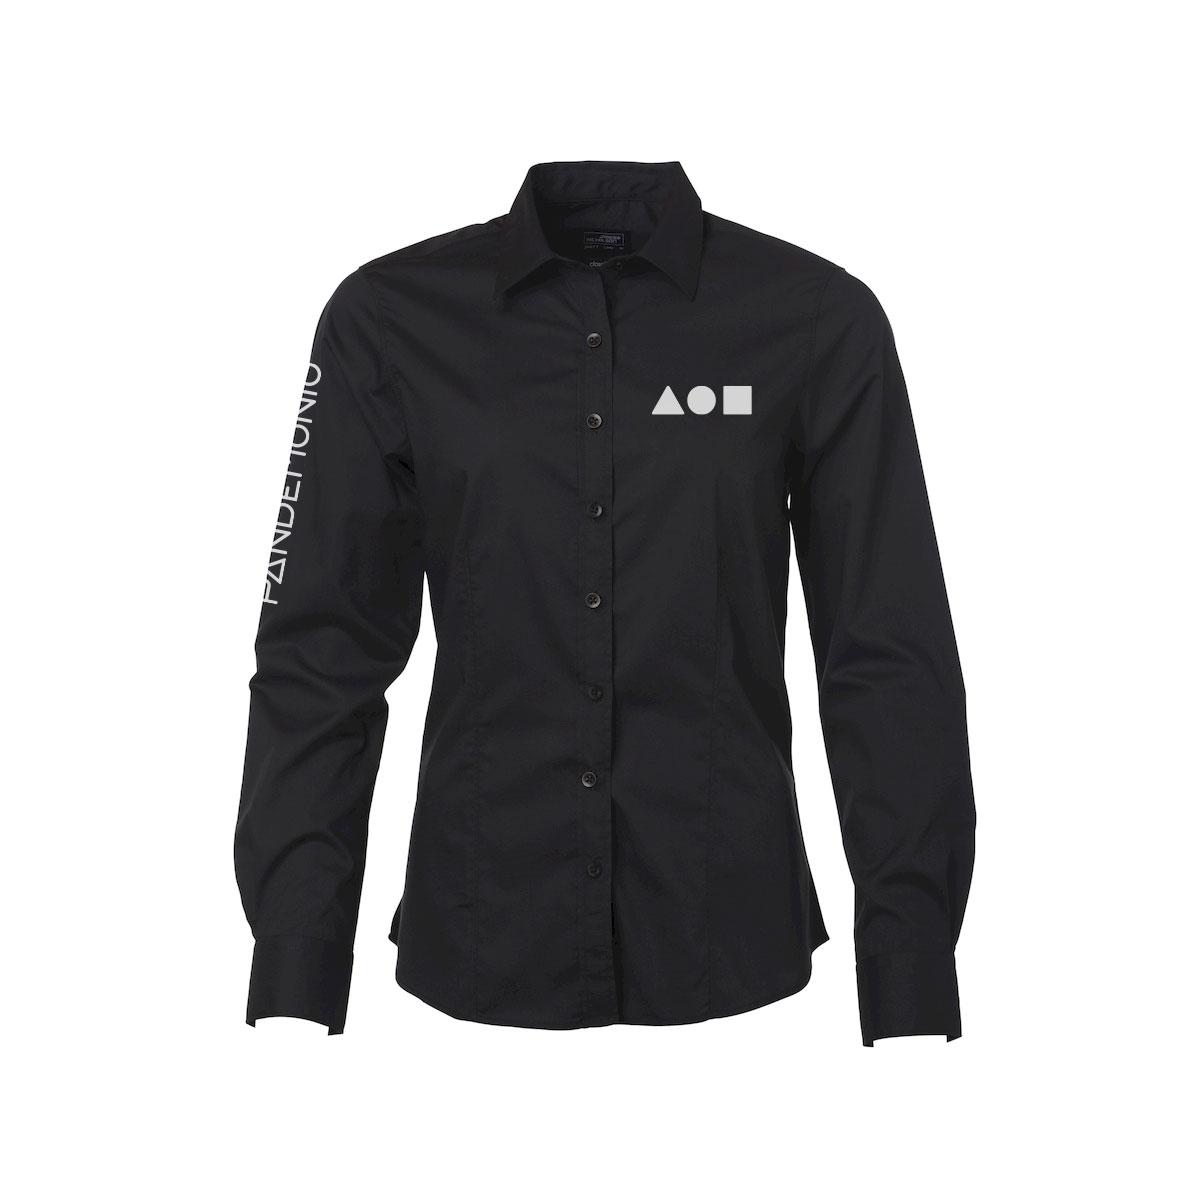 Camicia Pandemonio nera logo bianco